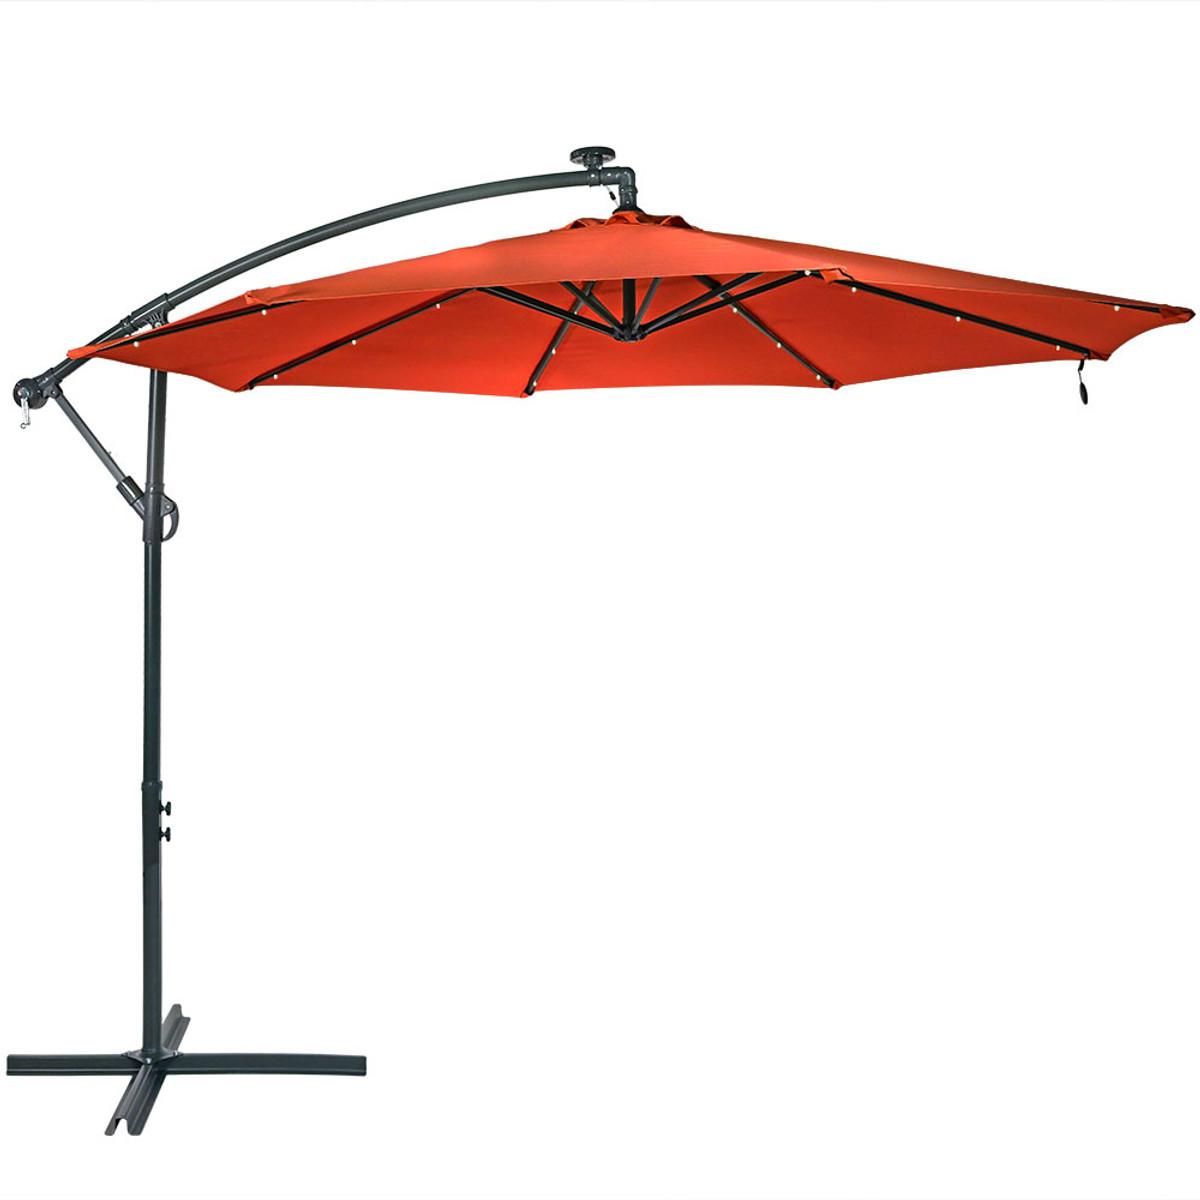 5899cec1be4d Sunnydaze Solar LED 10-Foot Offset Patio Umbrella with Cantilever, Crank,  and Cross Base